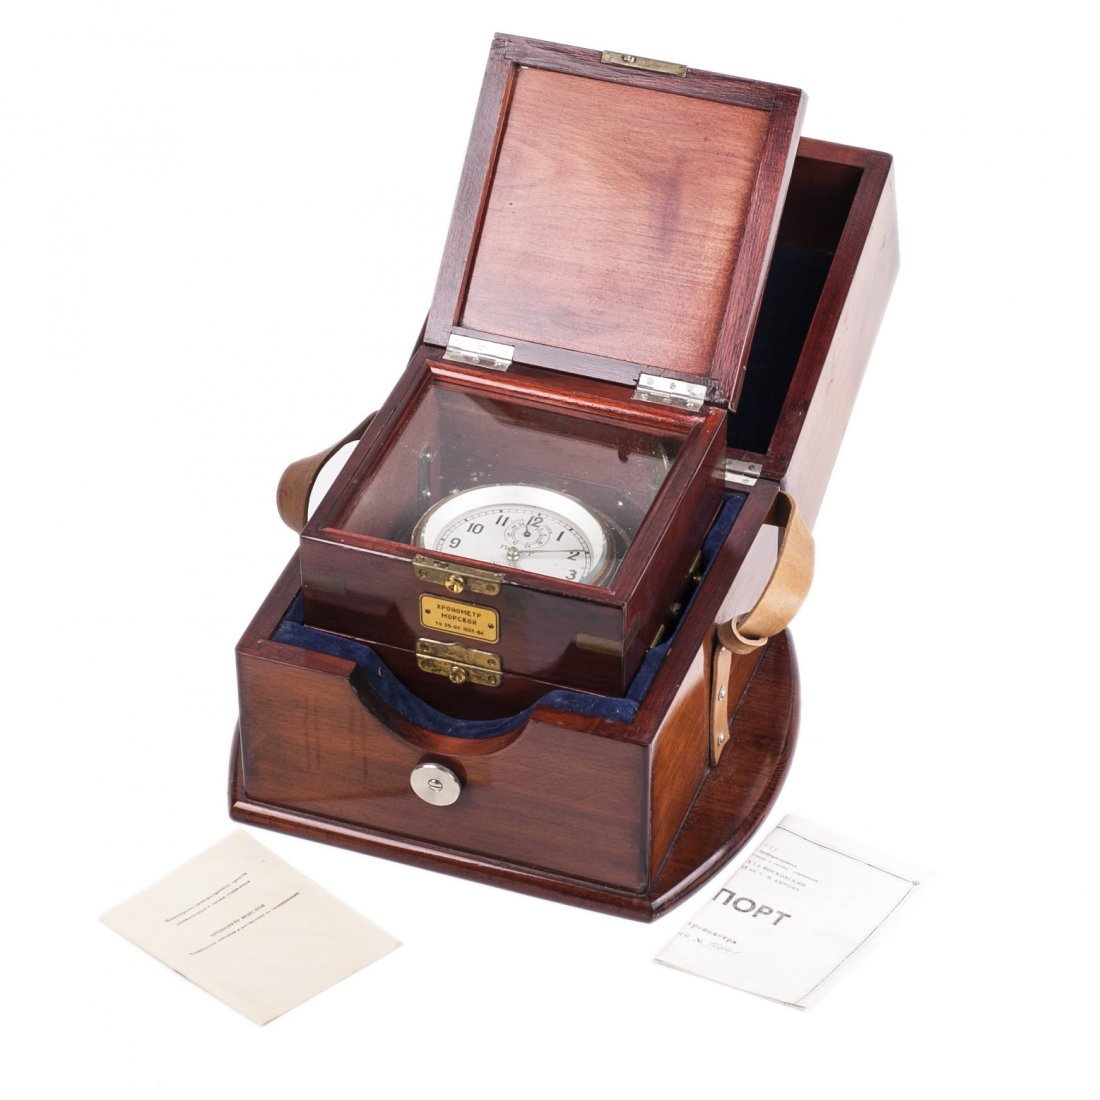 Two-day Russian marine chronometer